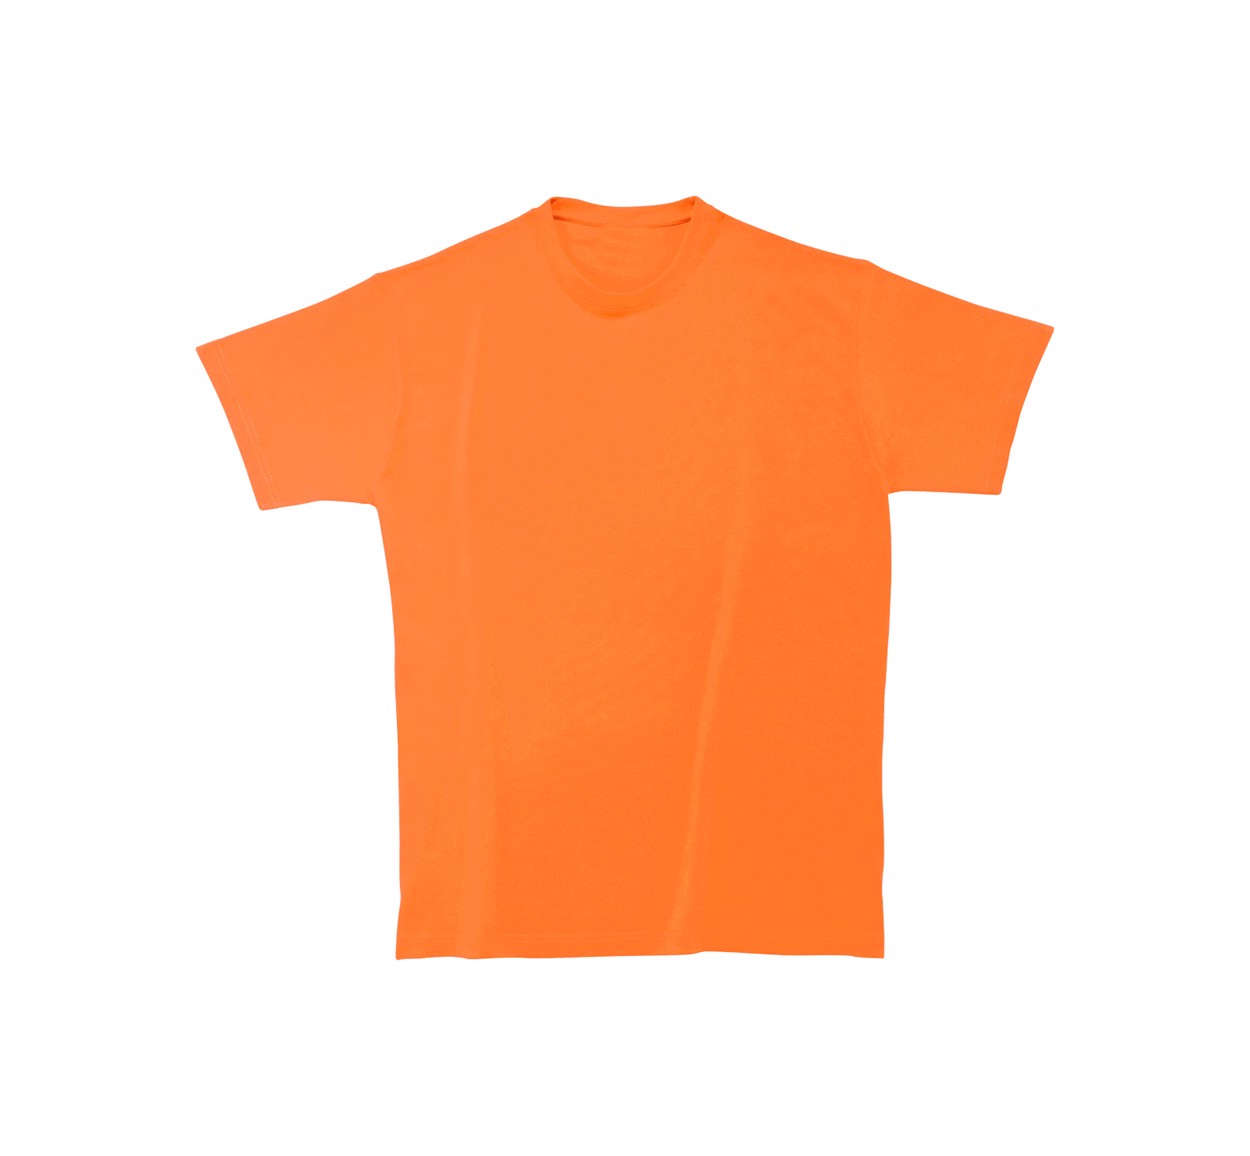 Tričko Heavy Cotton - Oranžová / XXL